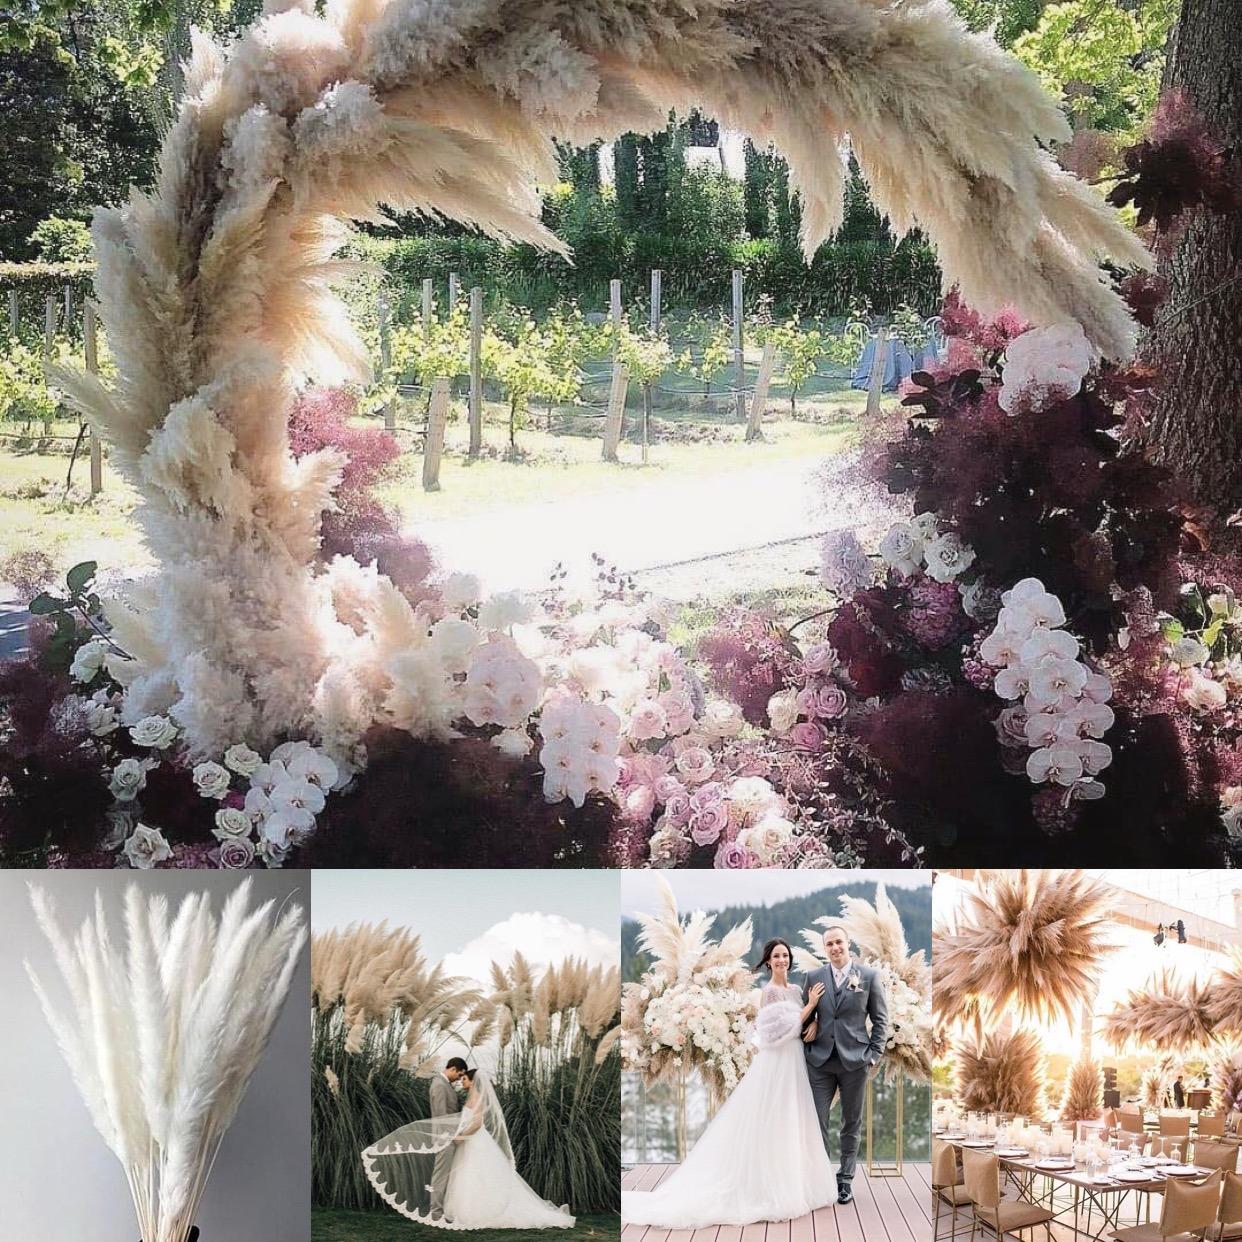 Natural Plants Dried Pampas Grass Reed Flower Bunch Wedding Decor Flower Arrangement Boho Bohemian Home Decor Feather Bouquet